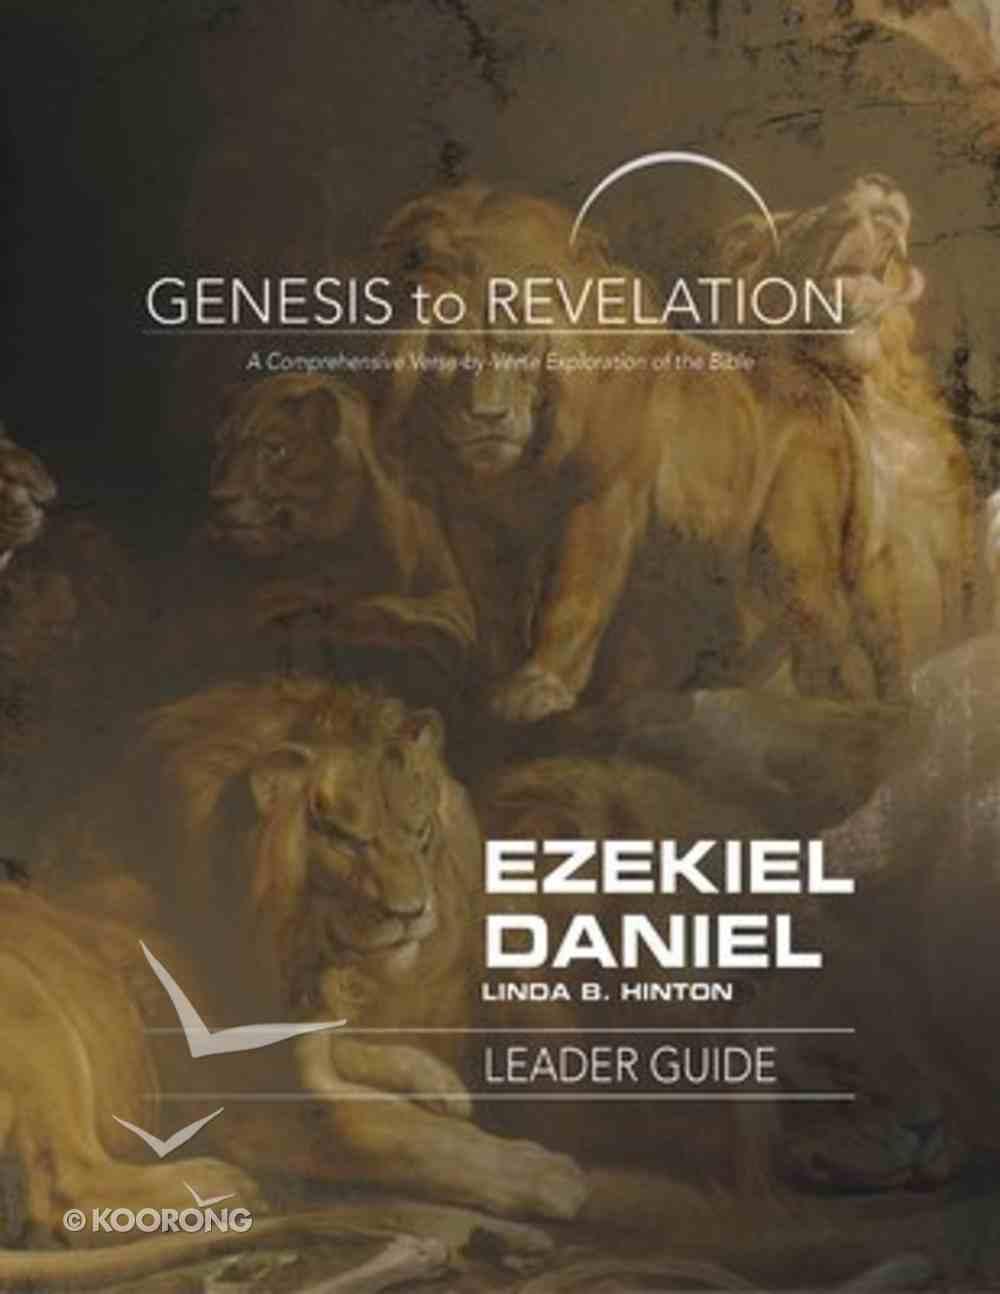 Ezekiel, Daniel : A Comprehensive Verse-By-Verse Exploration of the Bible (Leader Guide) (Genesis To Revelation Series) Paperback